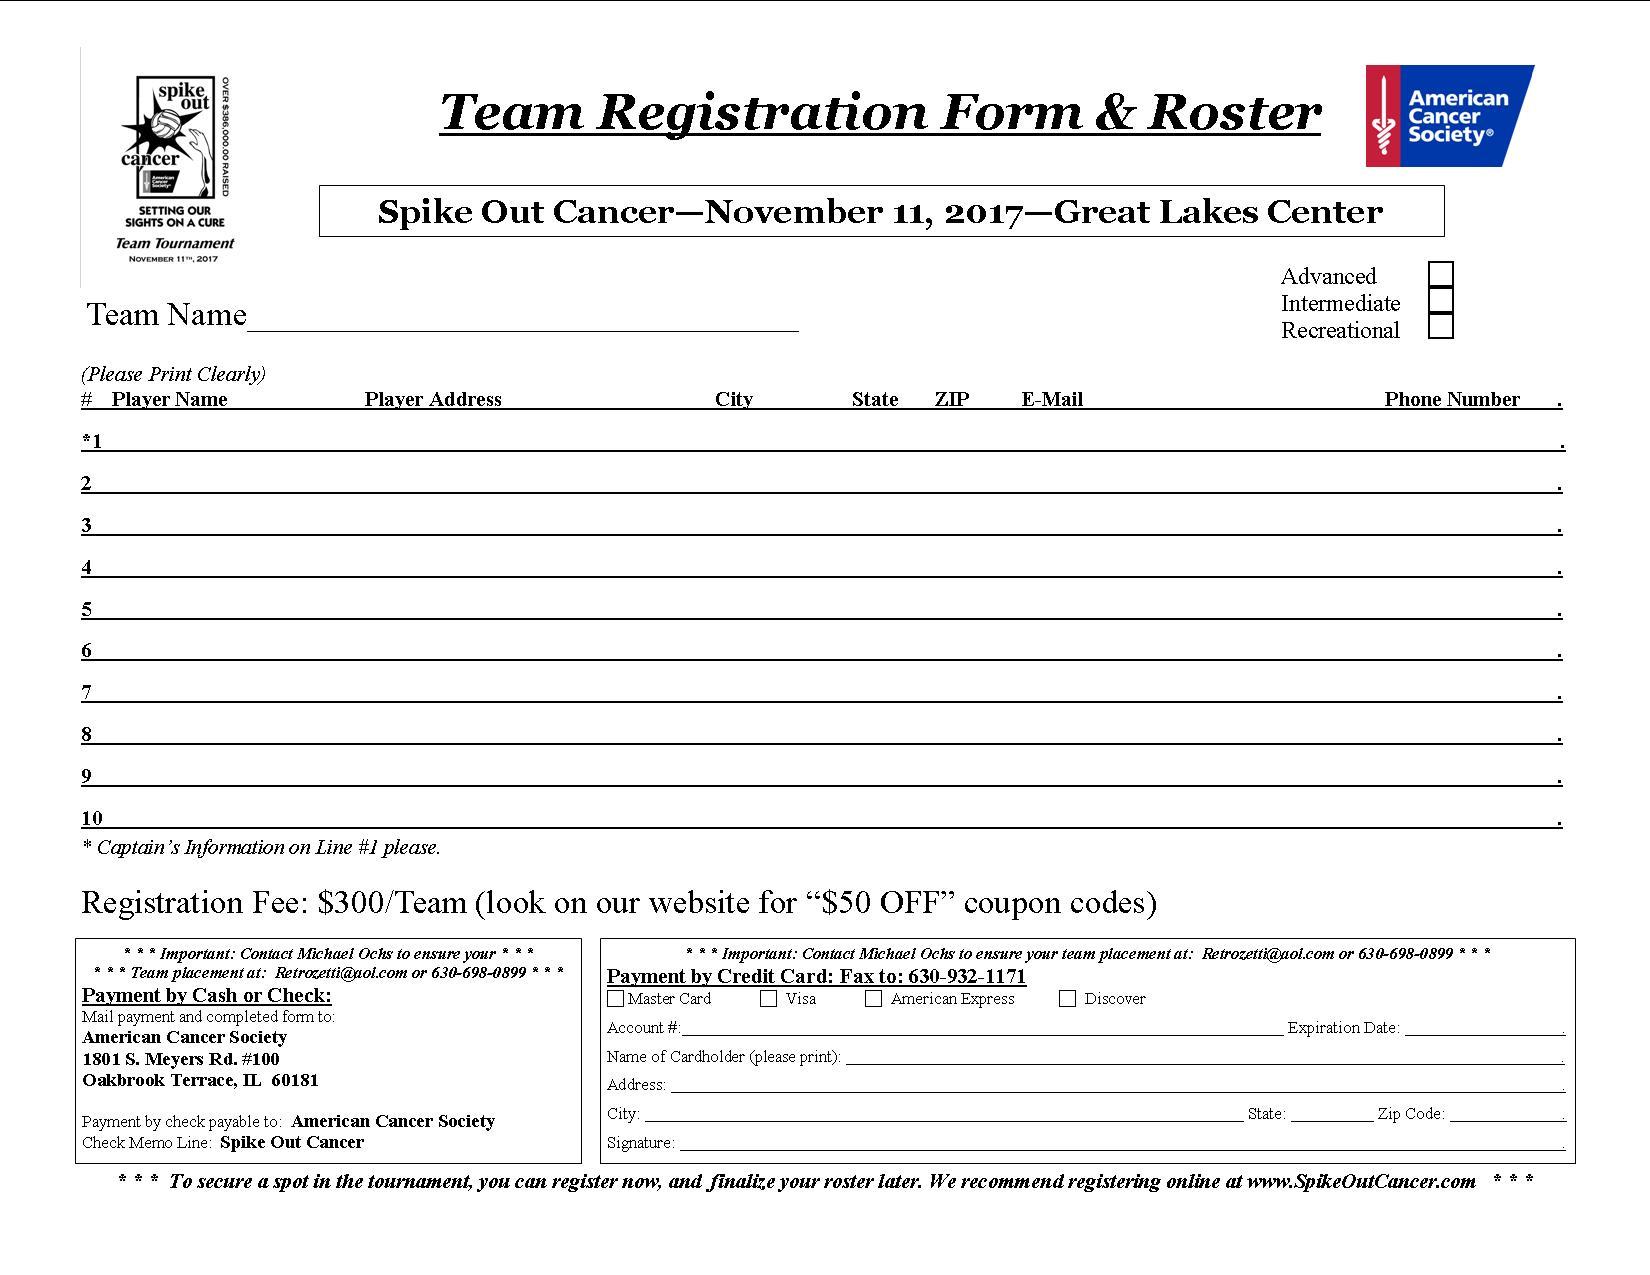 Team registration form template eliolera registration form template word best business template pronofoot35fo Gallery